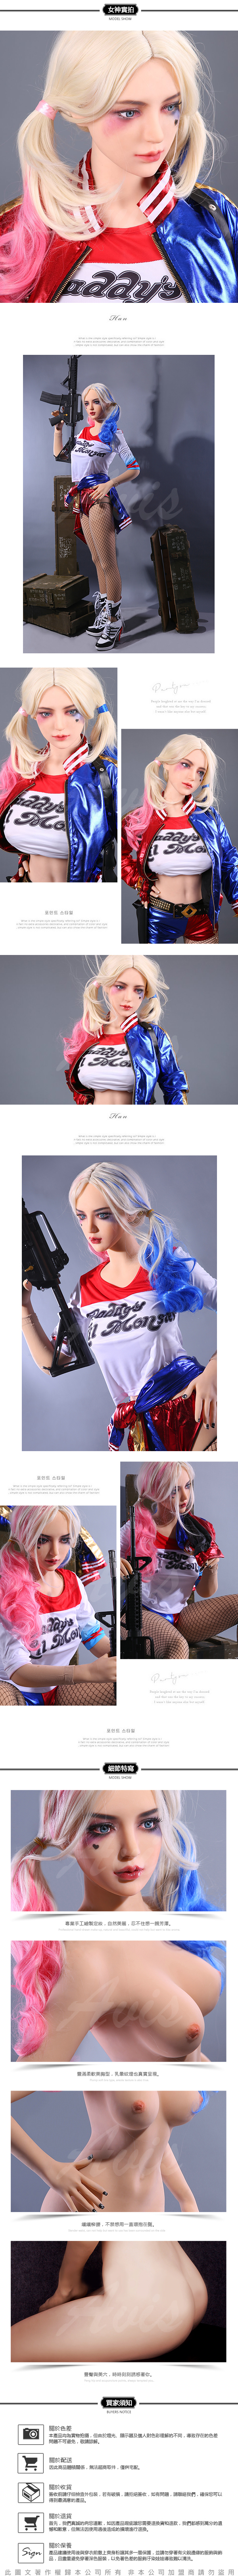 COS小丑女 QUINN 奎茵 全實體矽膠不銹鋼變形骨骼娃娃 突擊隊真人版(大胸版) 168cm